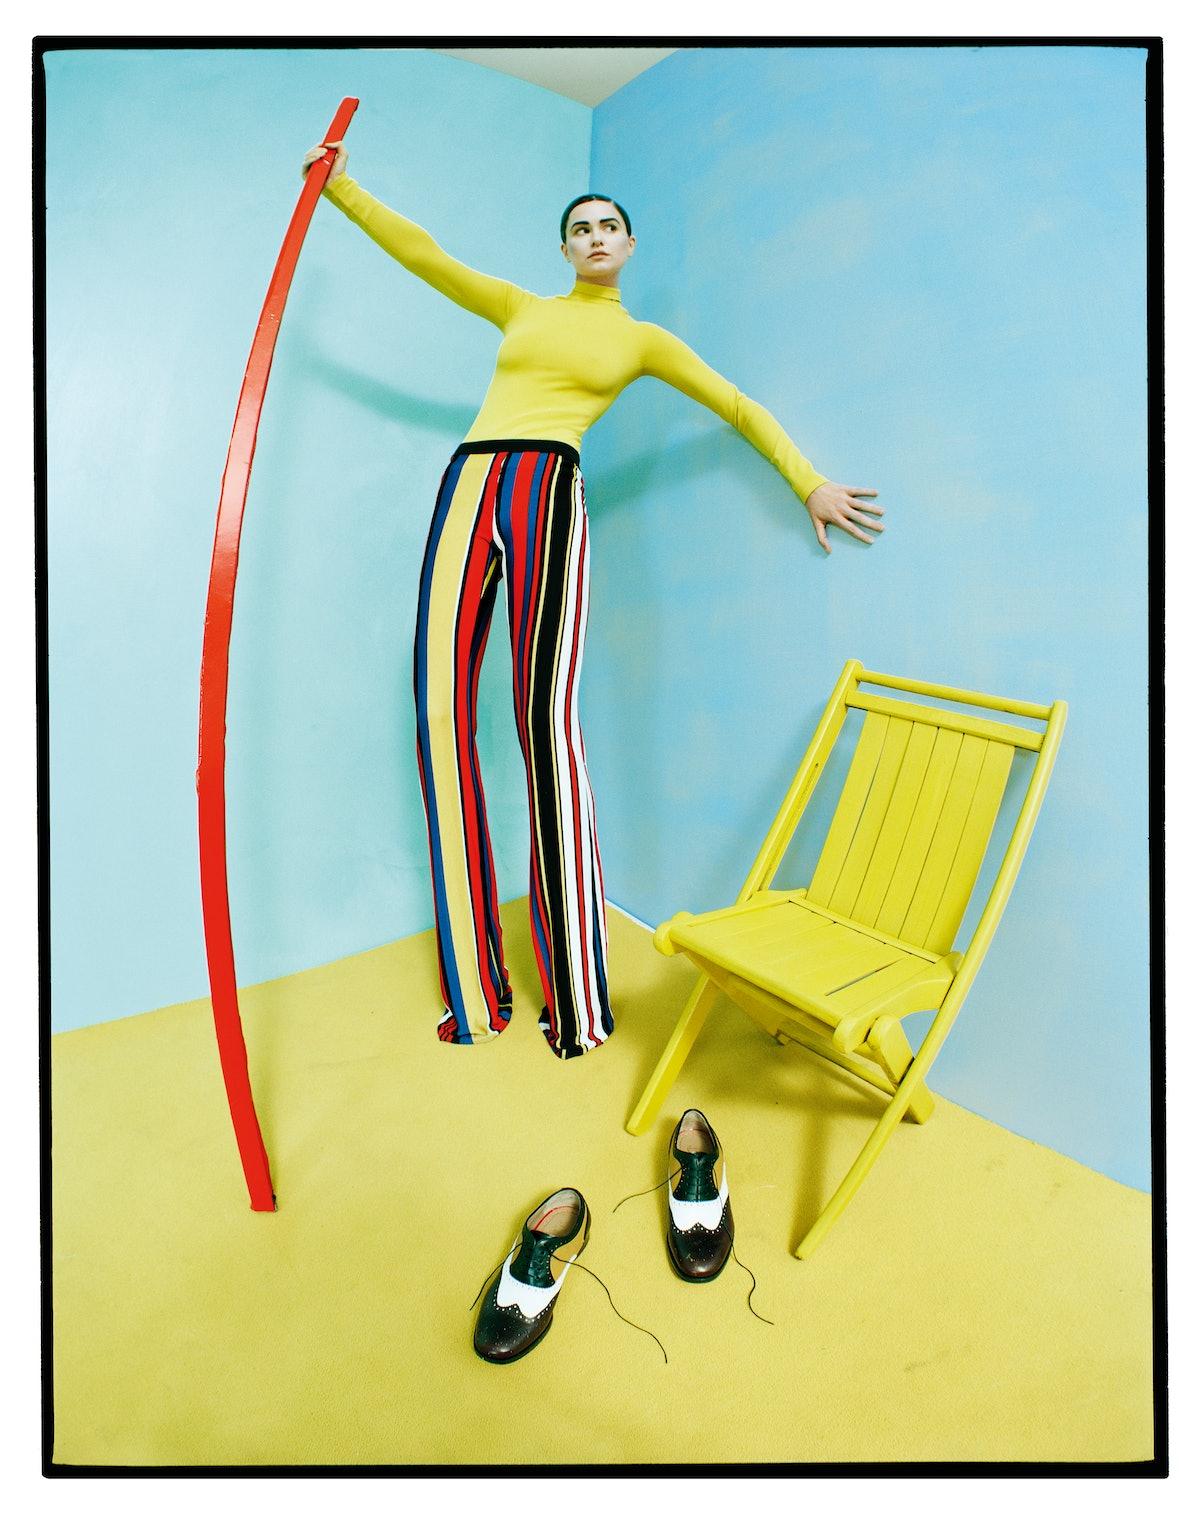 T by Alexander Wang turtleneck; Balmain trousers; Christian Louboutin flats.